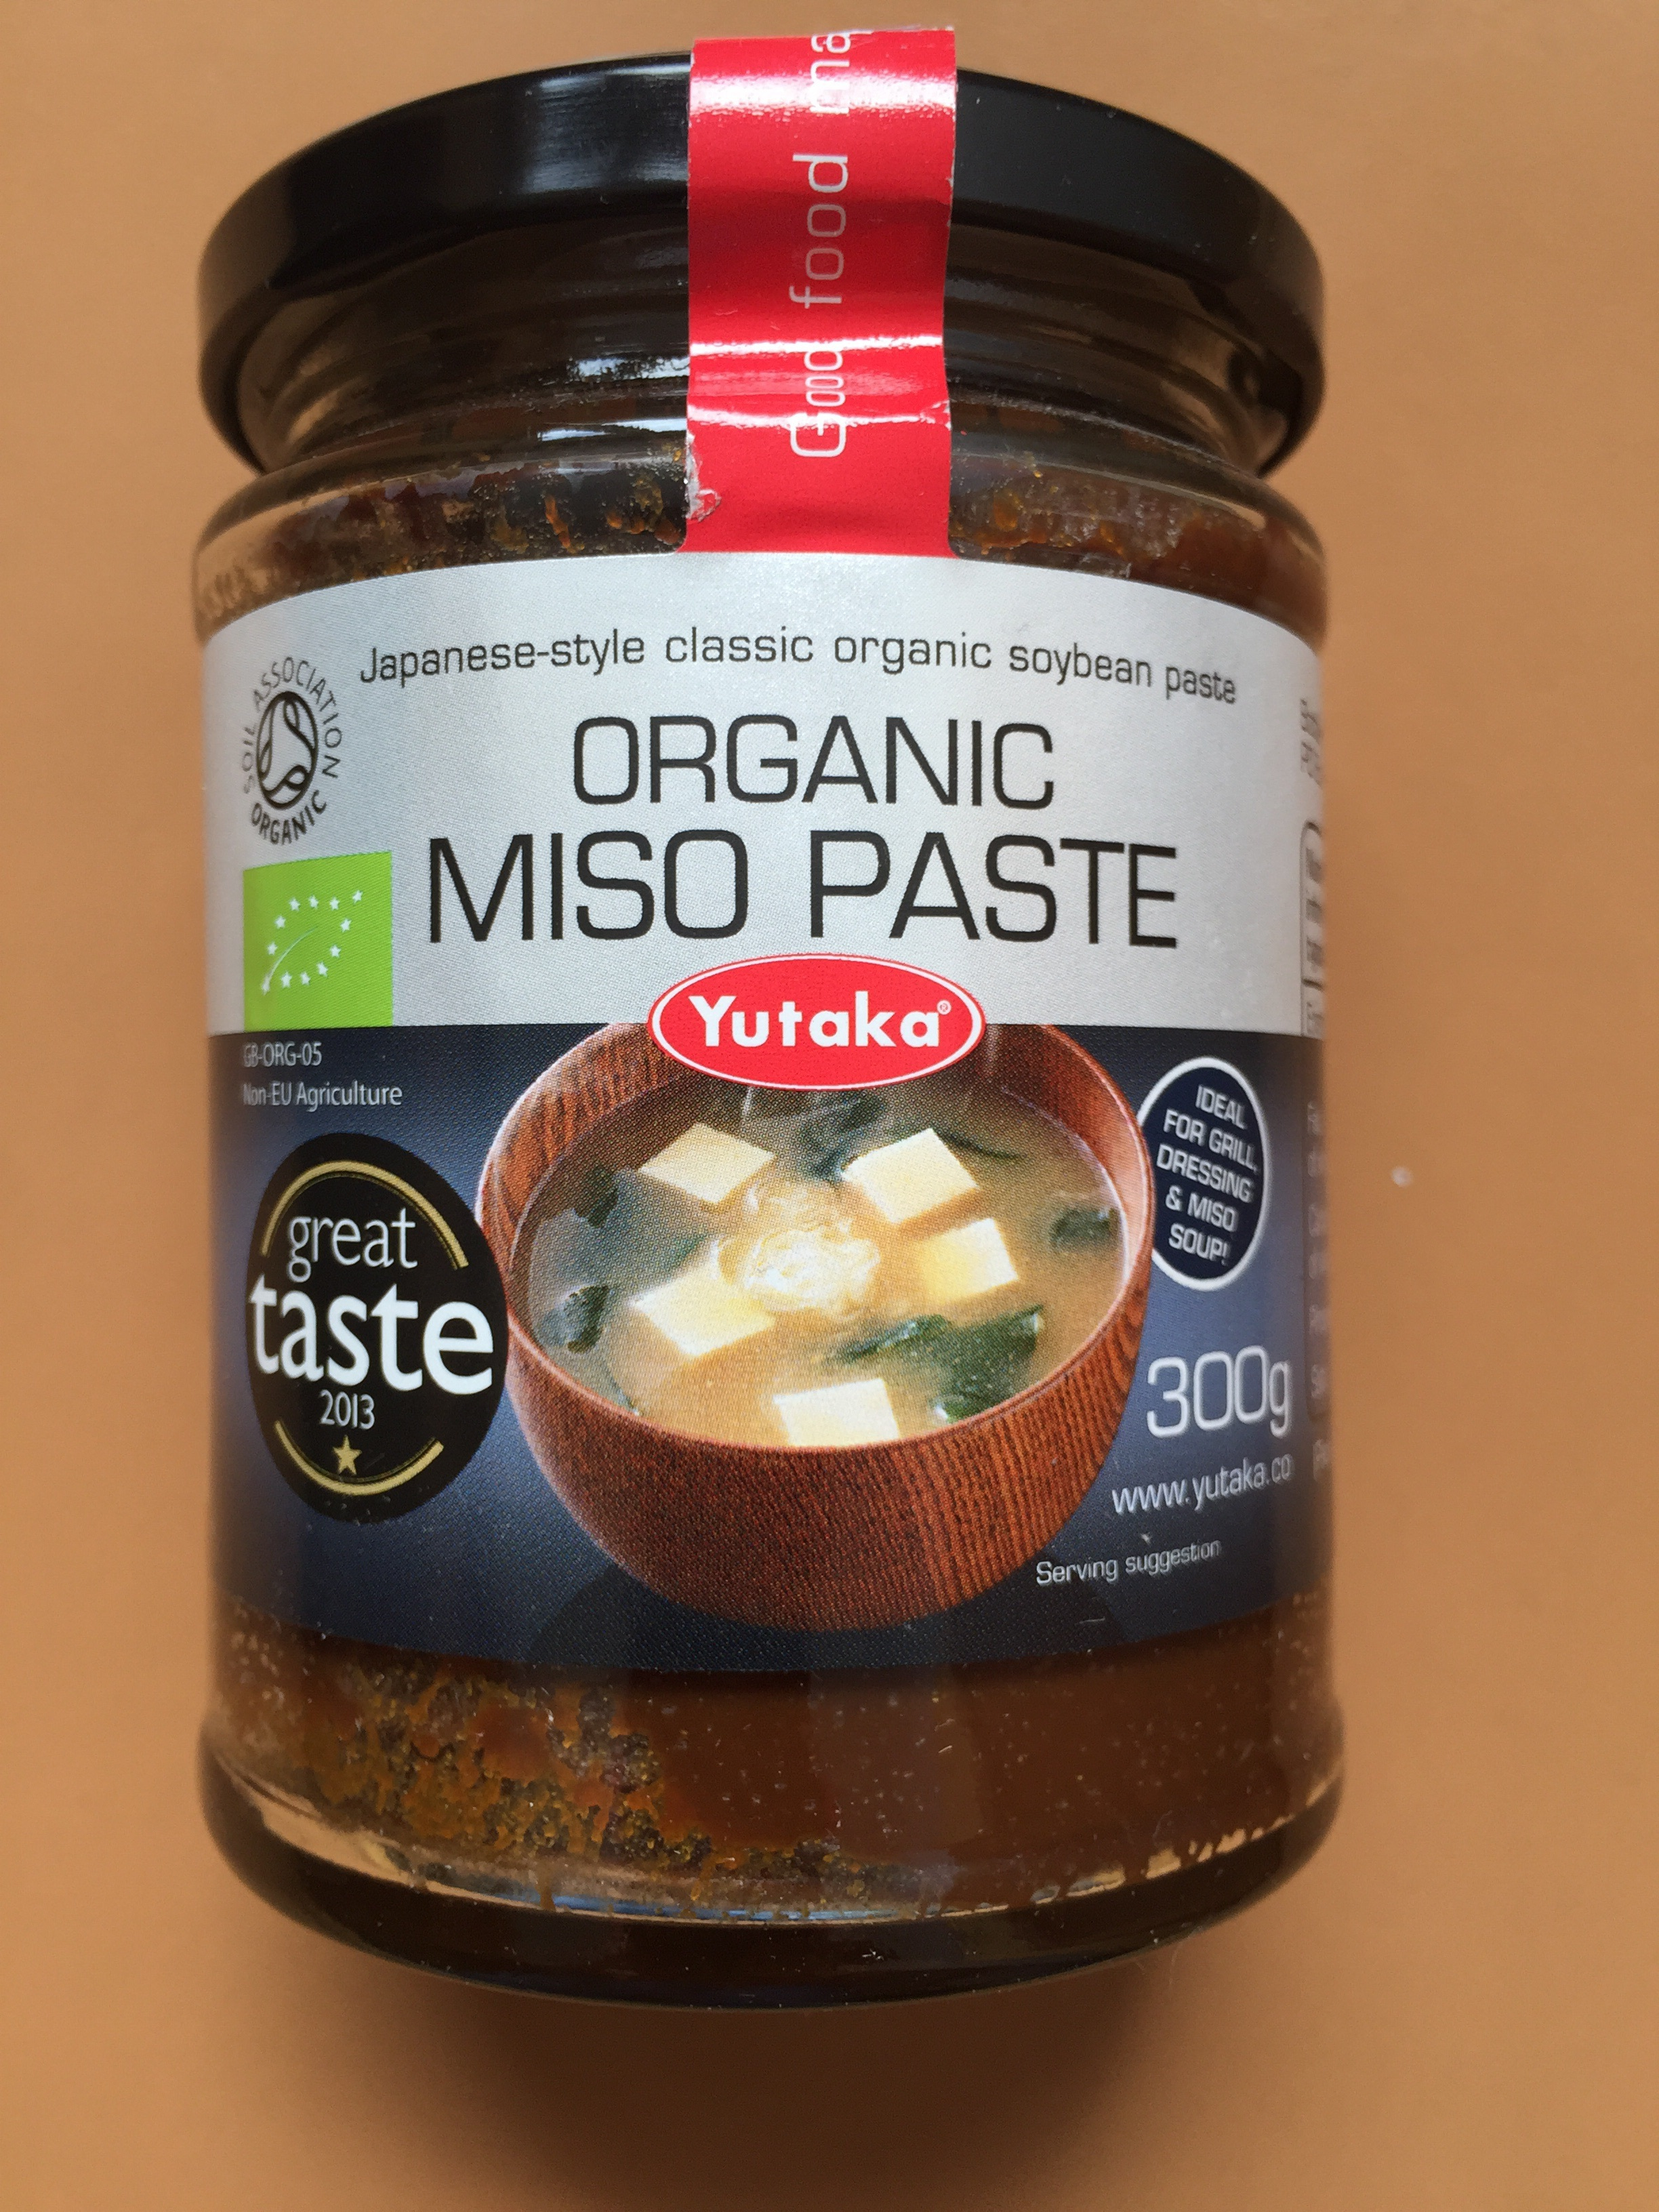 Organic miso paste